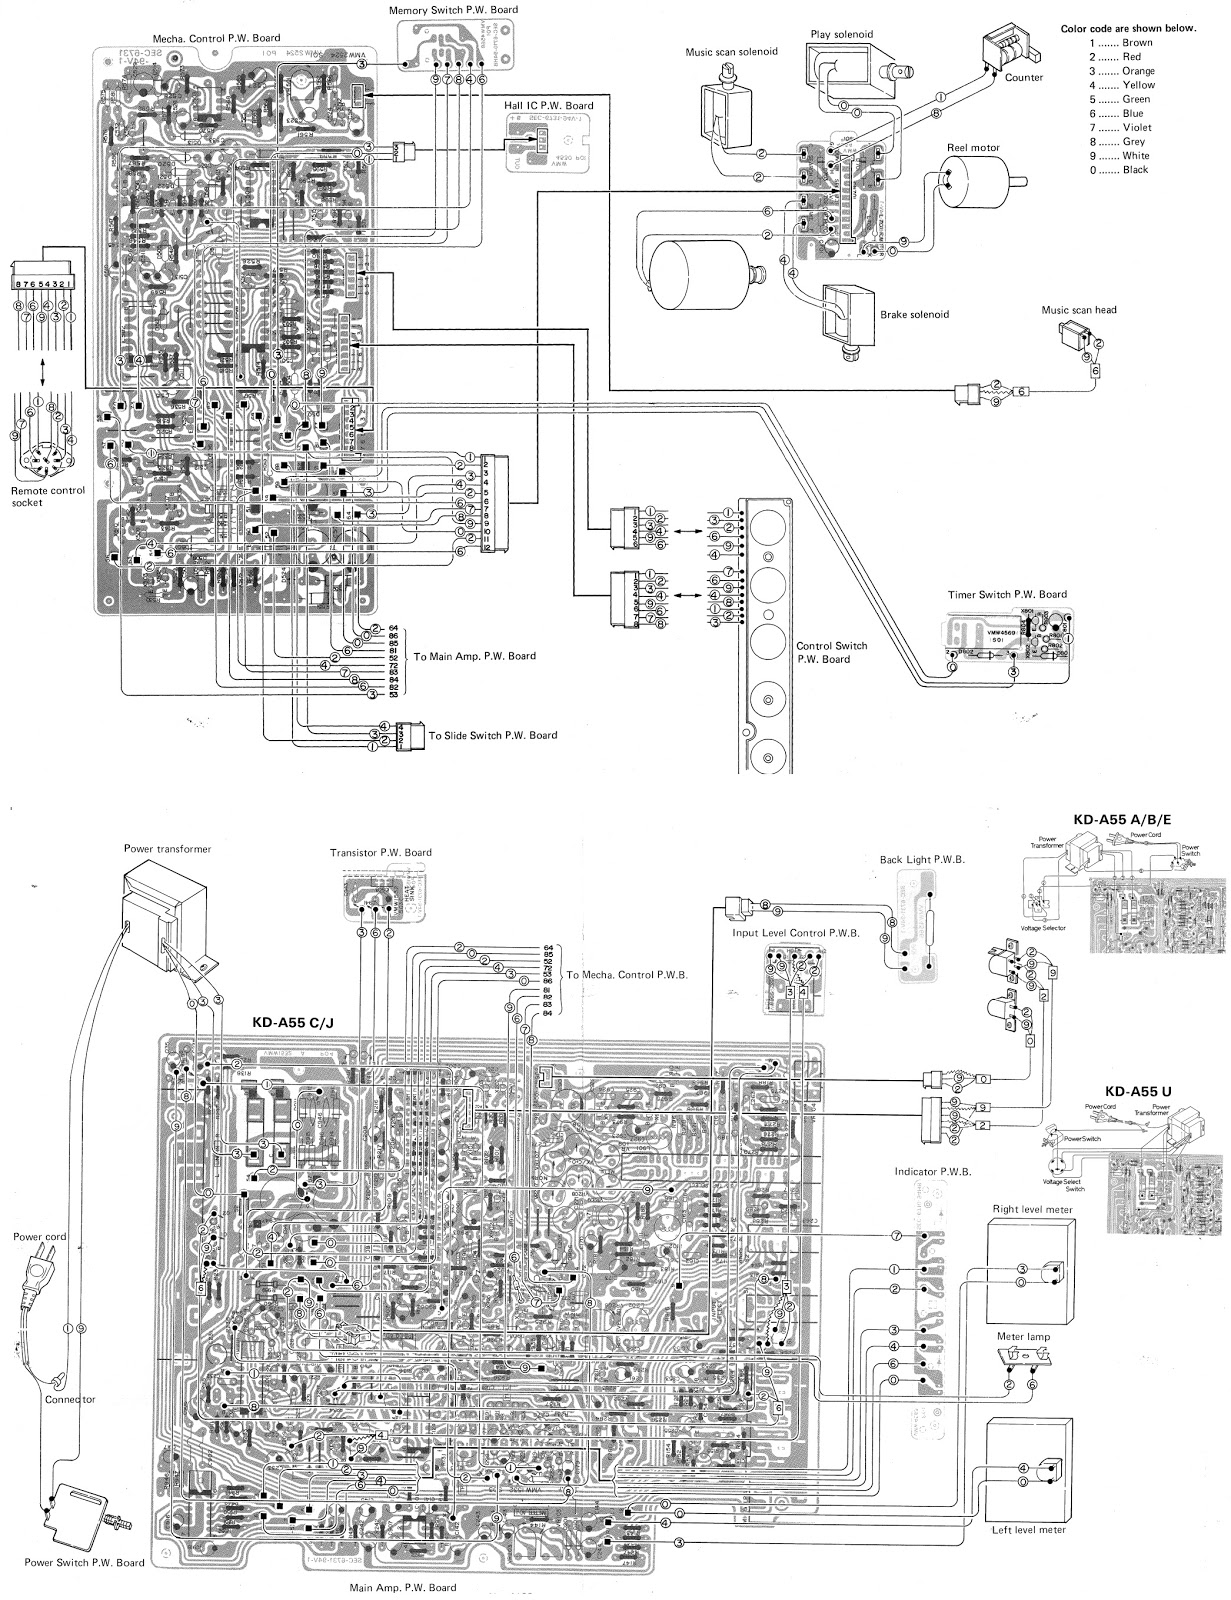 hight resolution of alpine ina w900 wiring diagram wiring diagram todays rh 3 18 10 1813weddingbarn com alpine ina